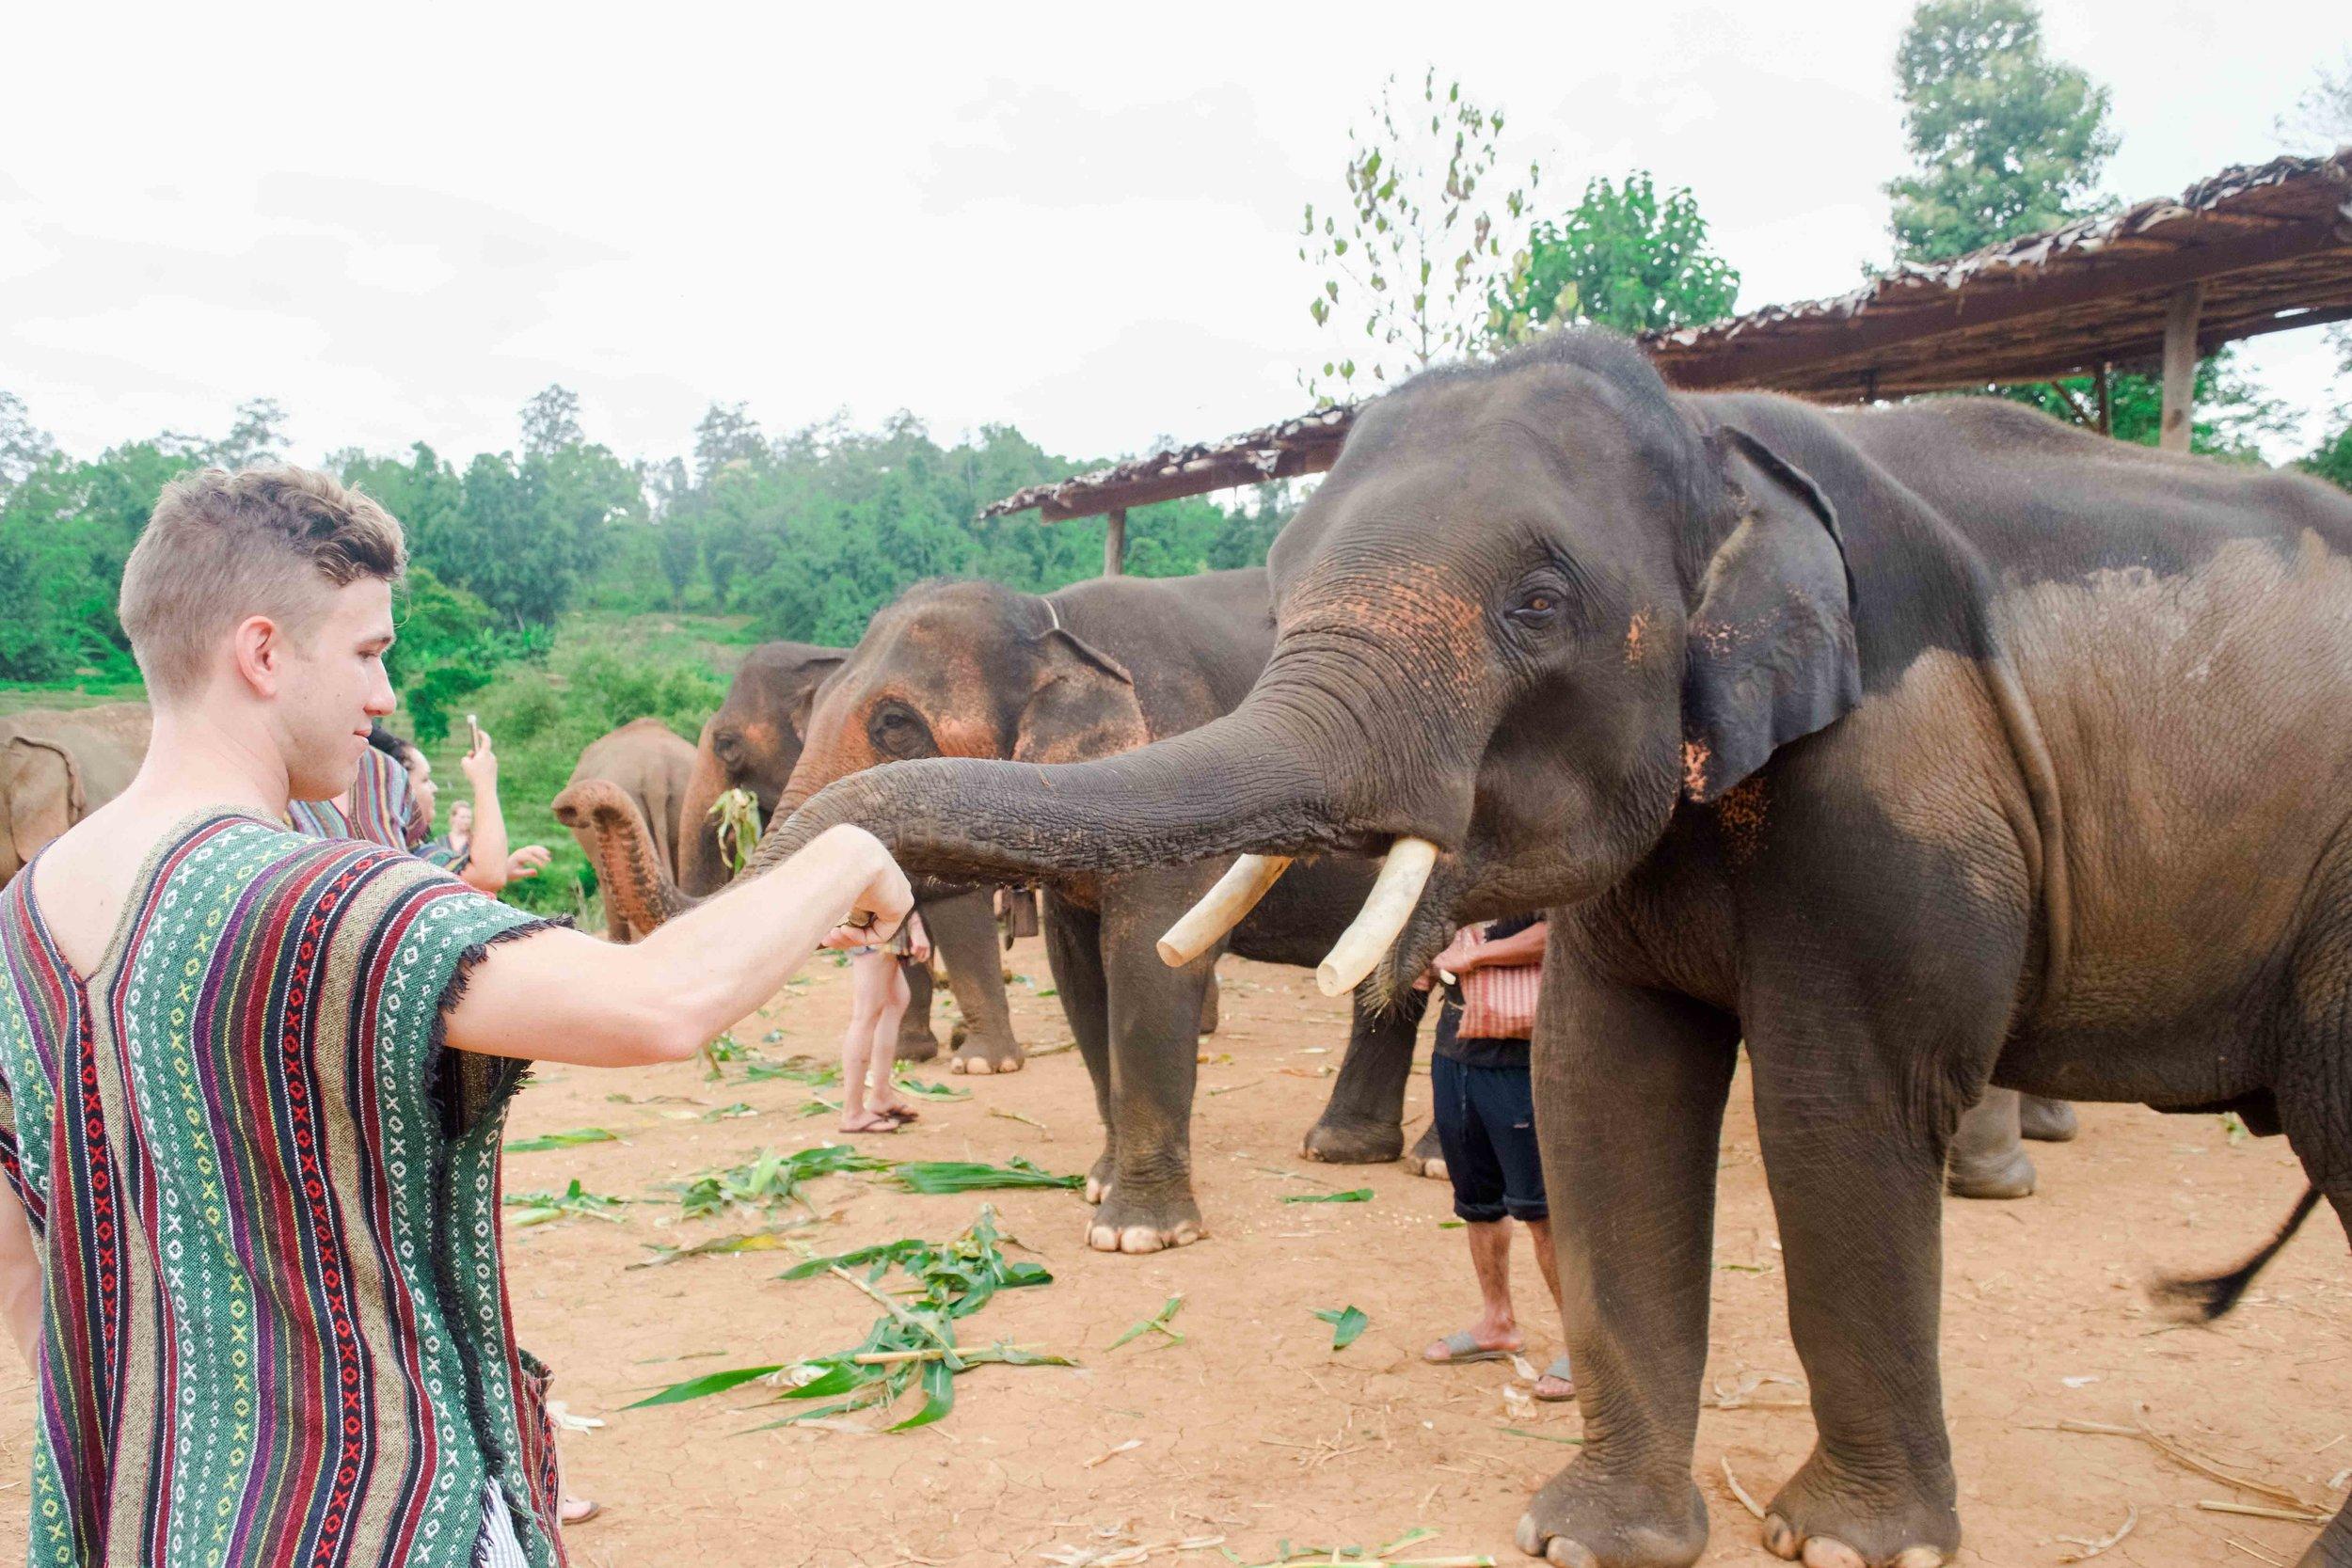 Feeding an elephant at Elephant Nature Park in Chiang Mai